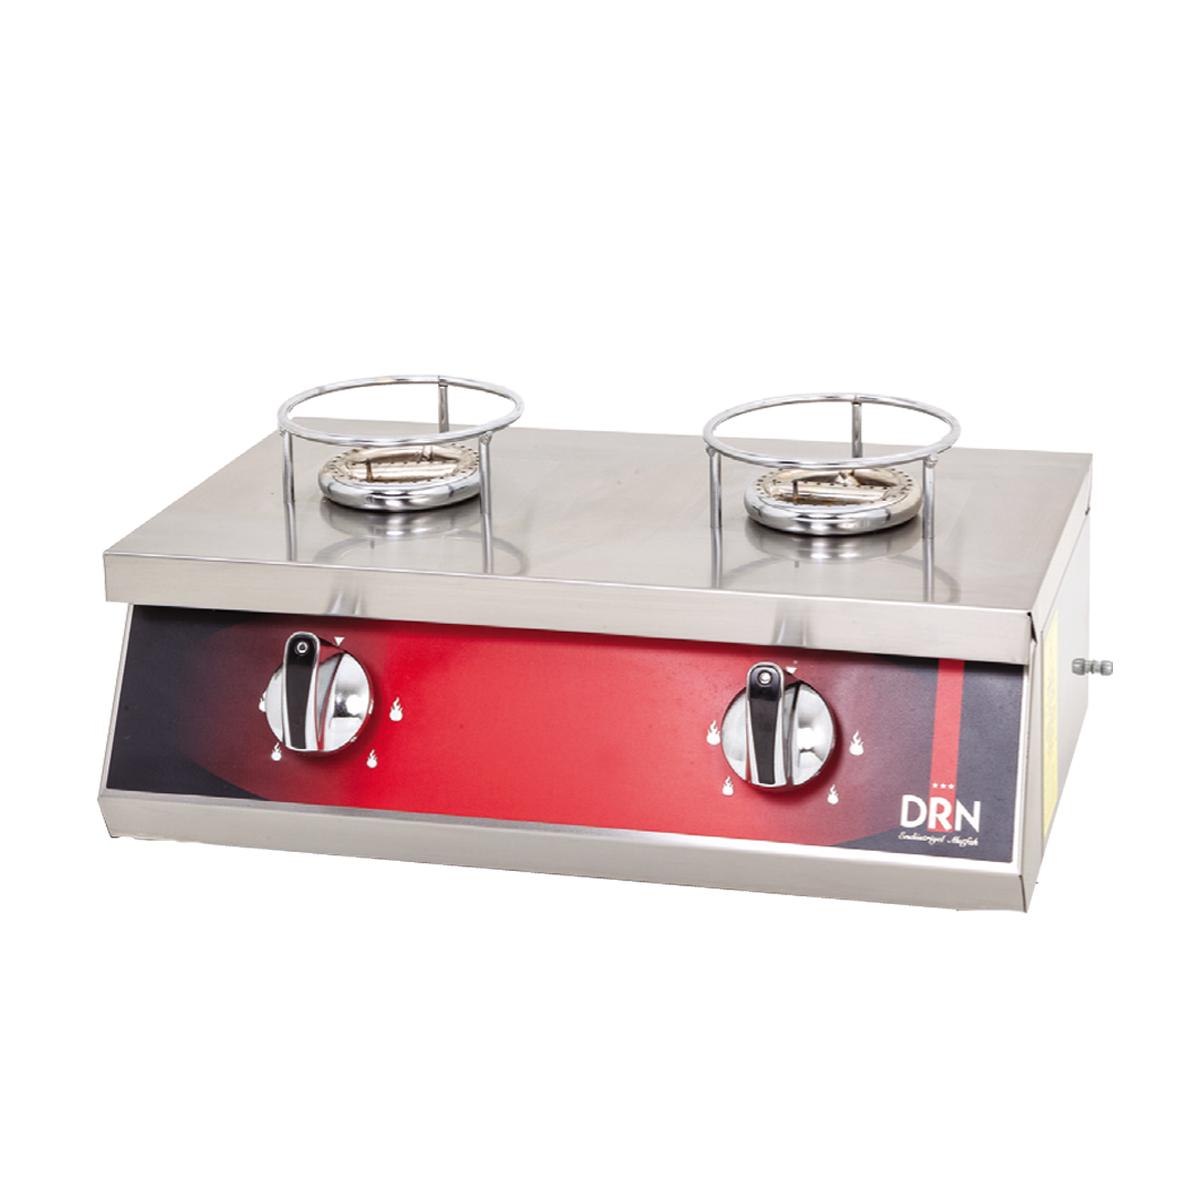 Kunefe Cooker - 2 Burners - Gas